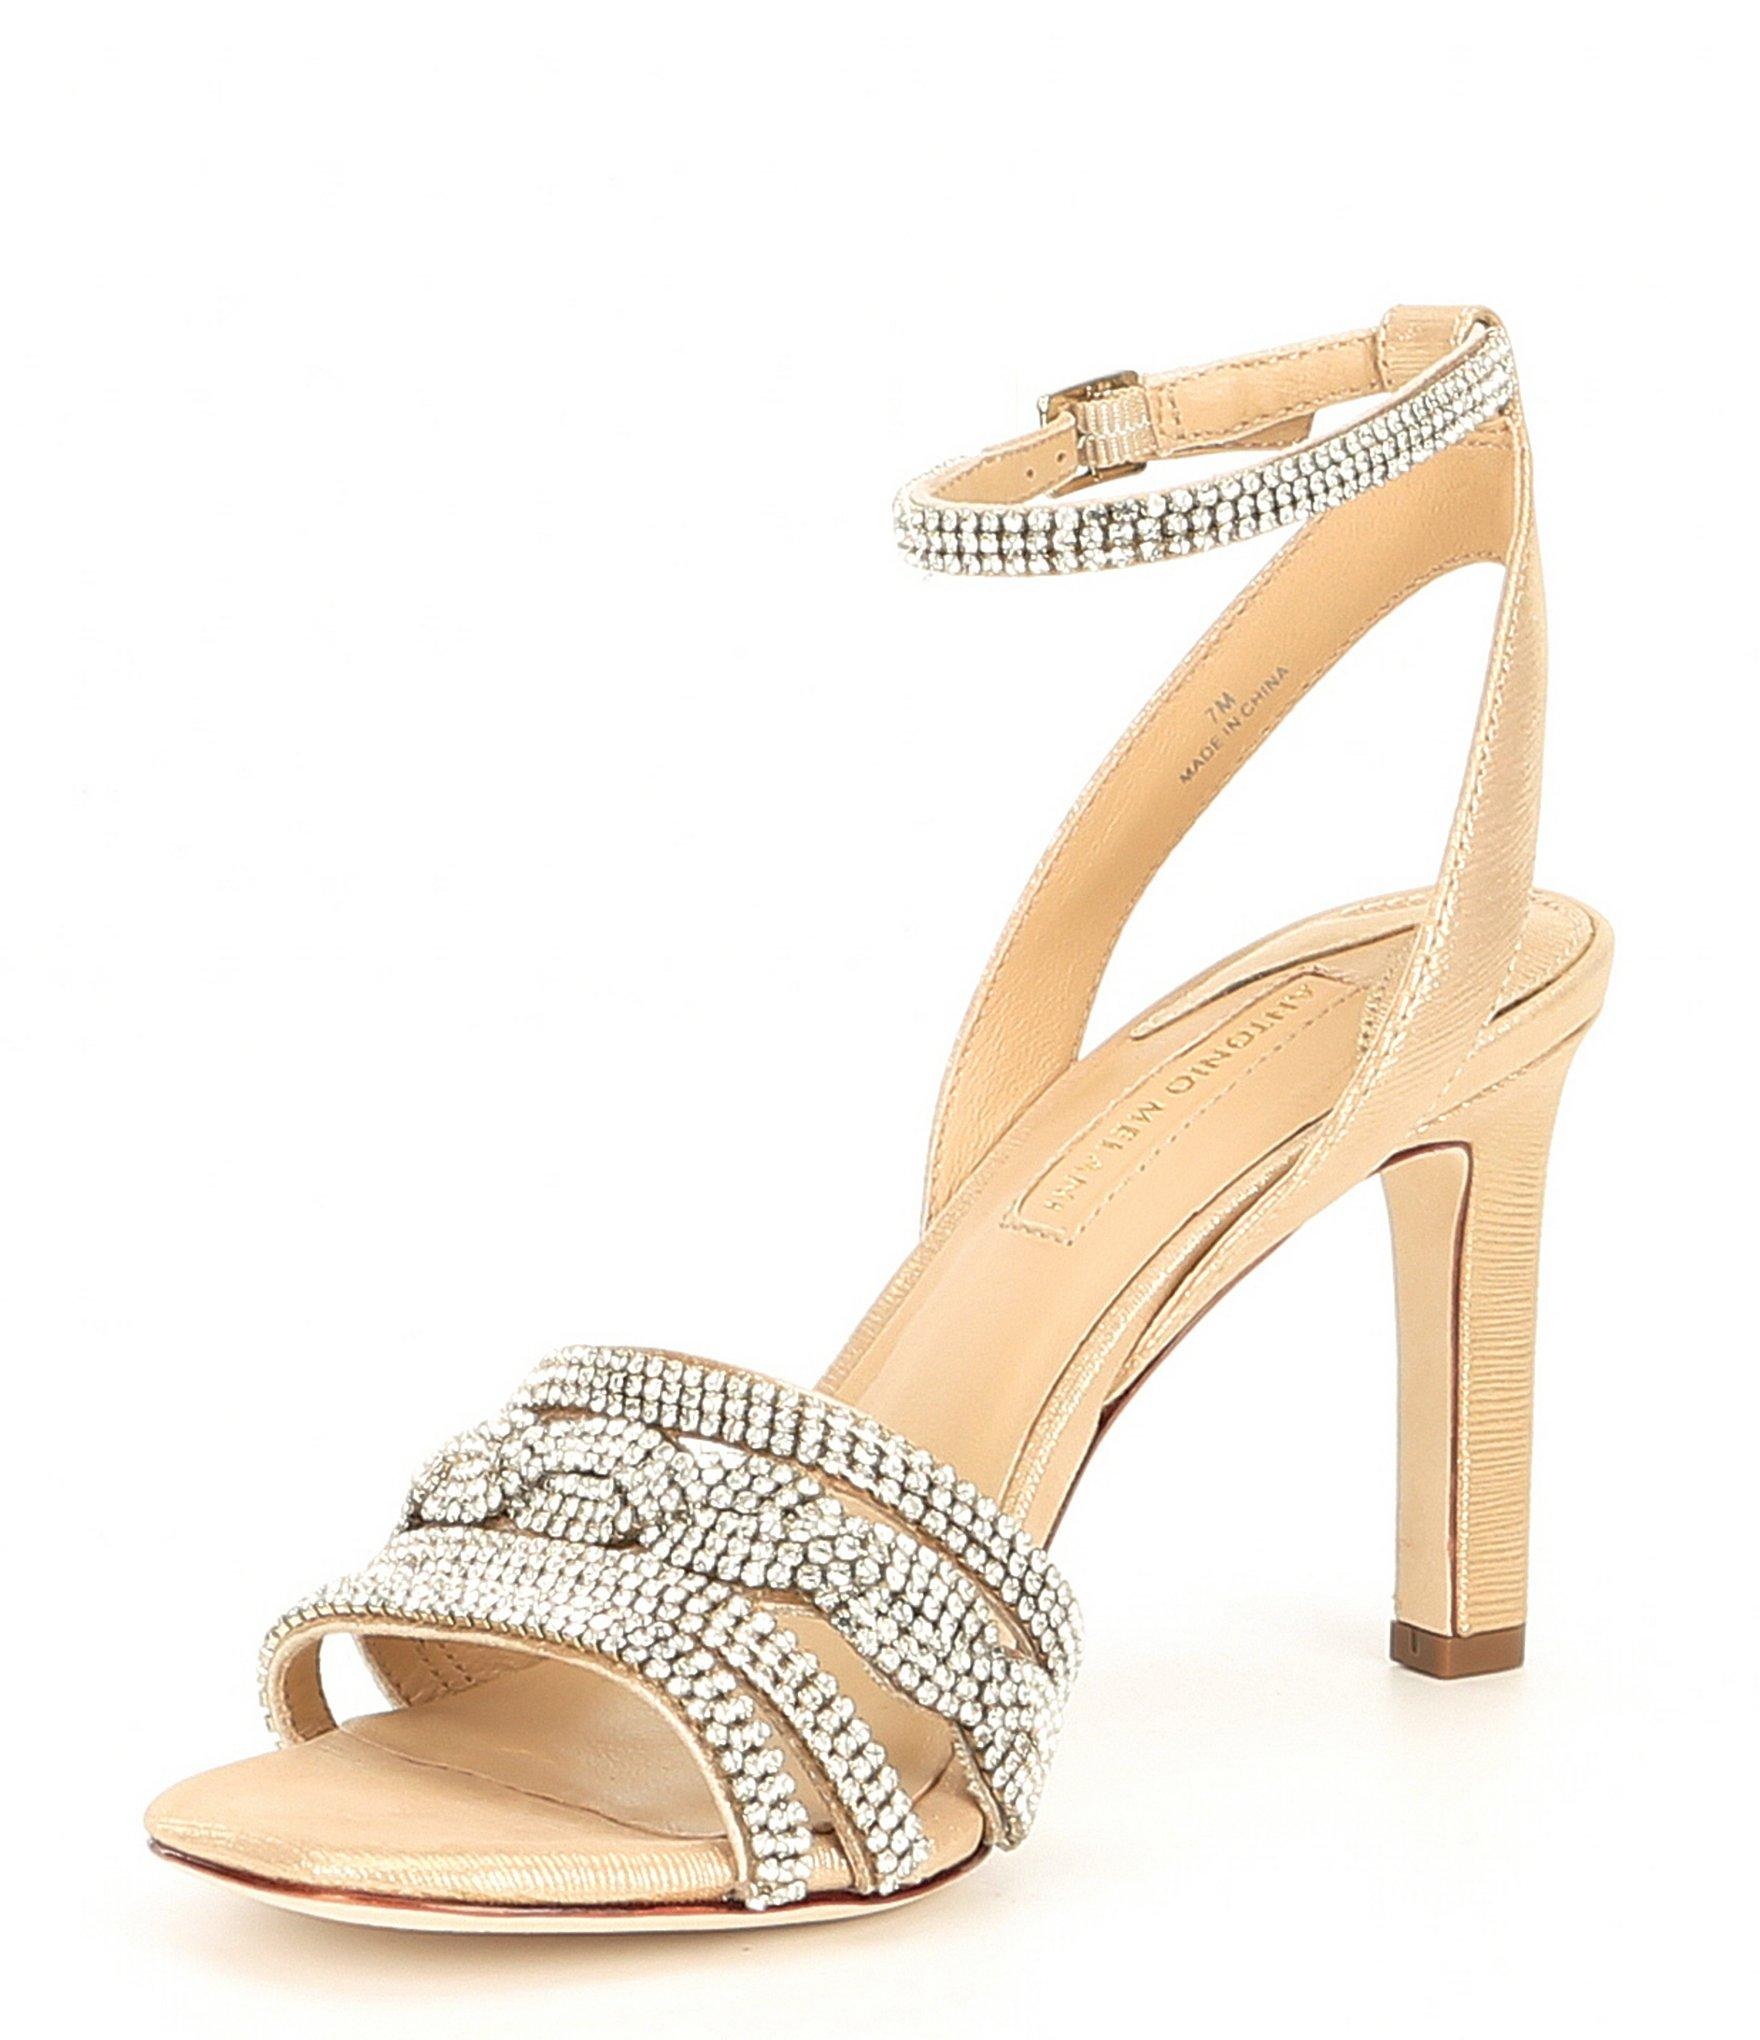 3b34e959e Antonio Melani - Petrina Metallic Leather   Rhinestone Dress Sandals - Lyst.  View fullscreen